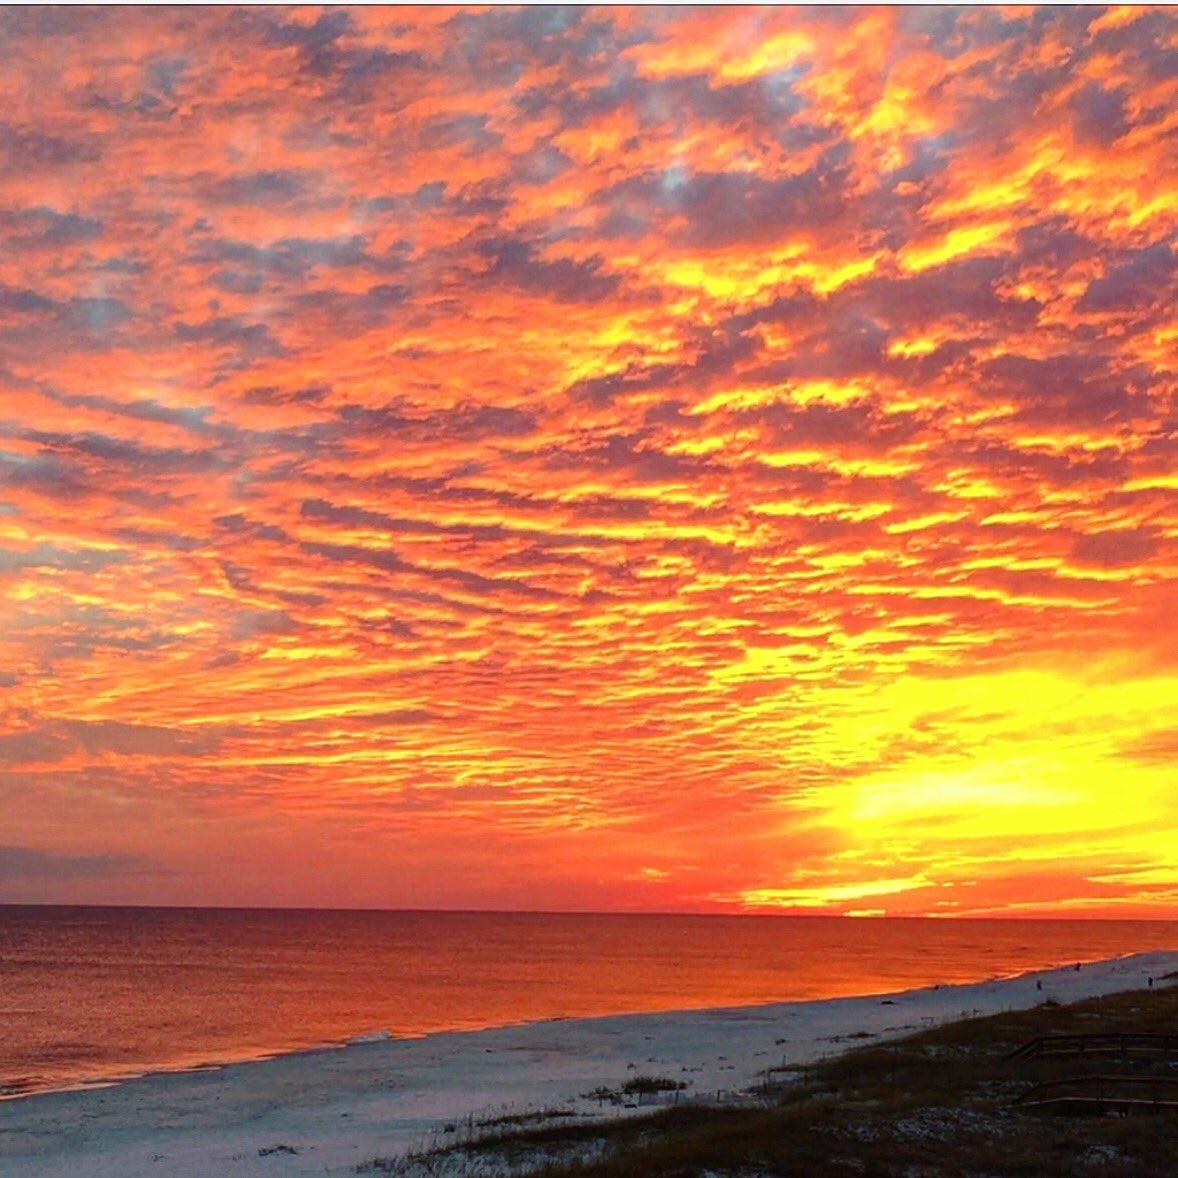 RT @Myscoopus: What a sunset in Perdido Key @spann #lovefl #sunset #perdidokey https://t.co/CeCfwwwfYS